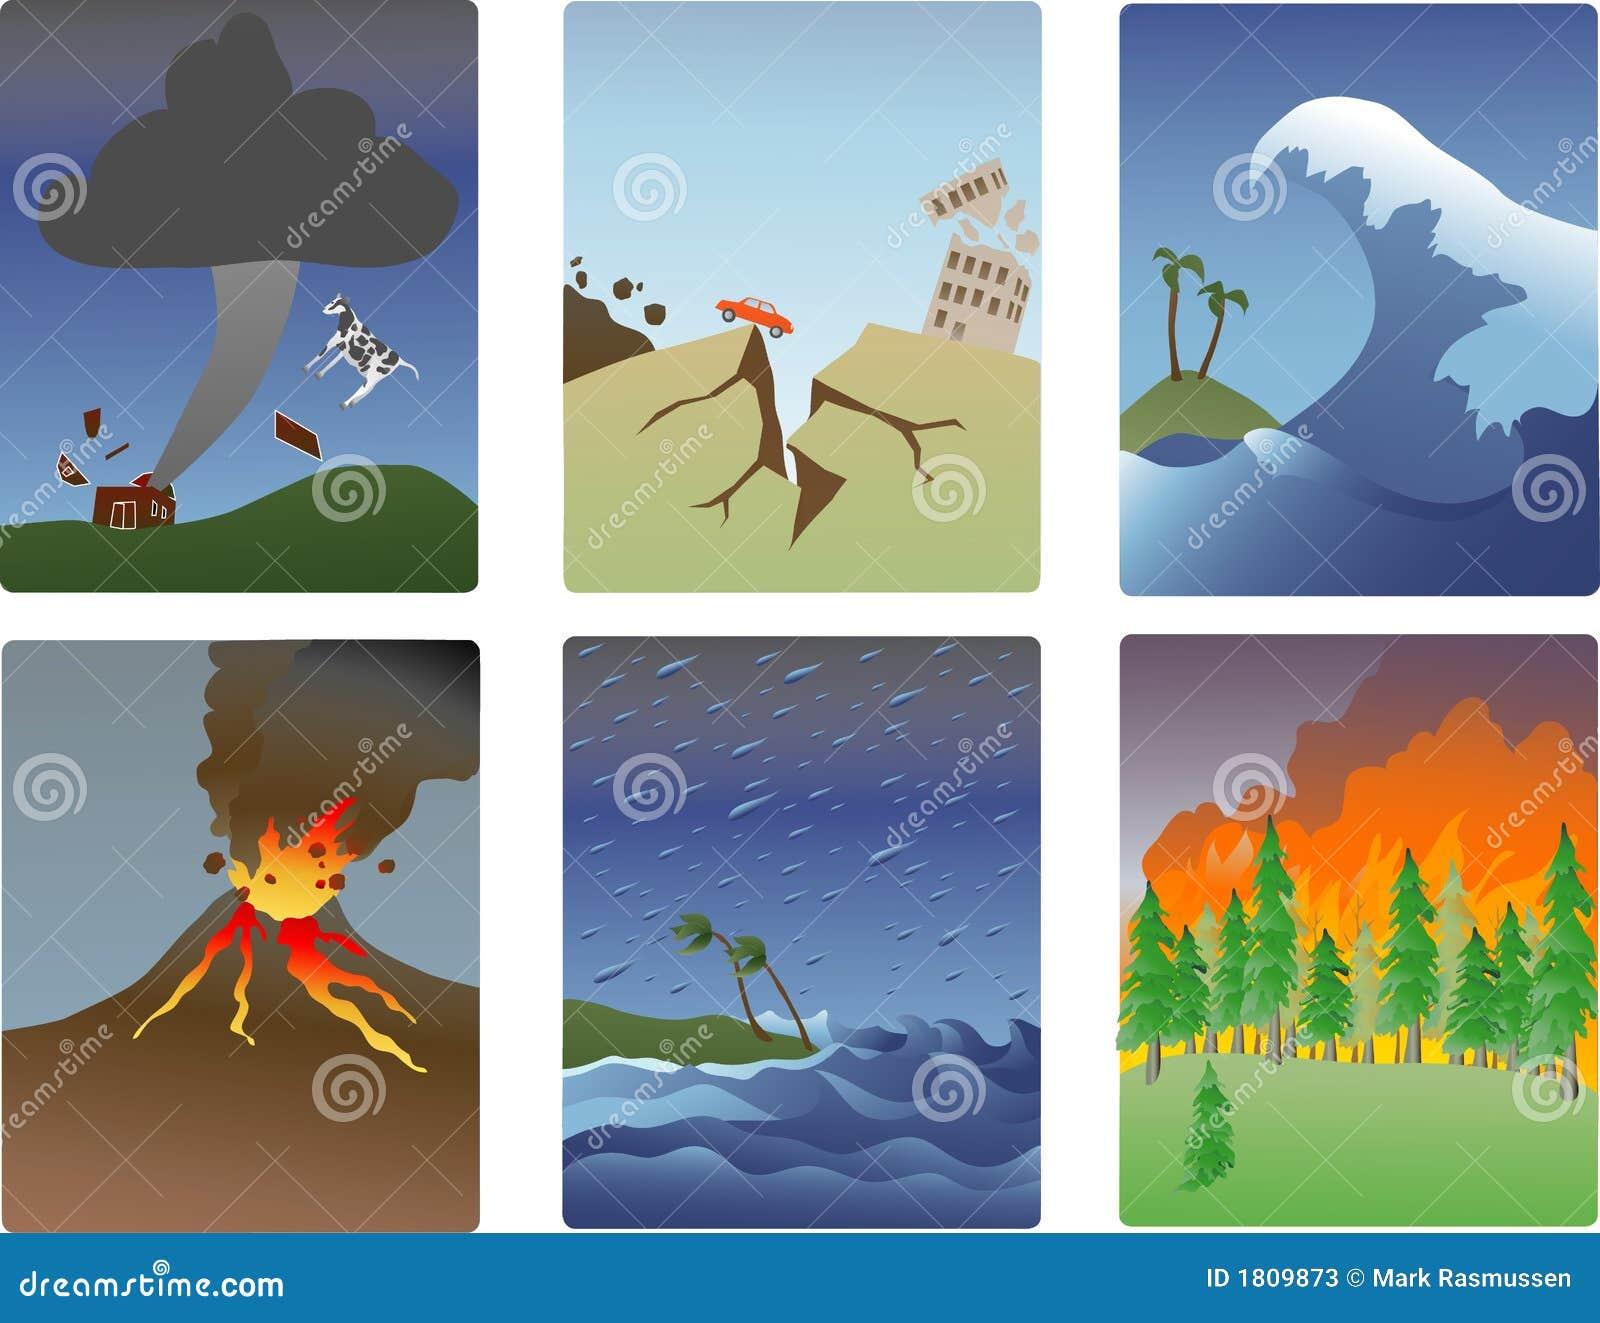 ... -tornado, earthquake, tsunami, volcano, hurricane, forest fire